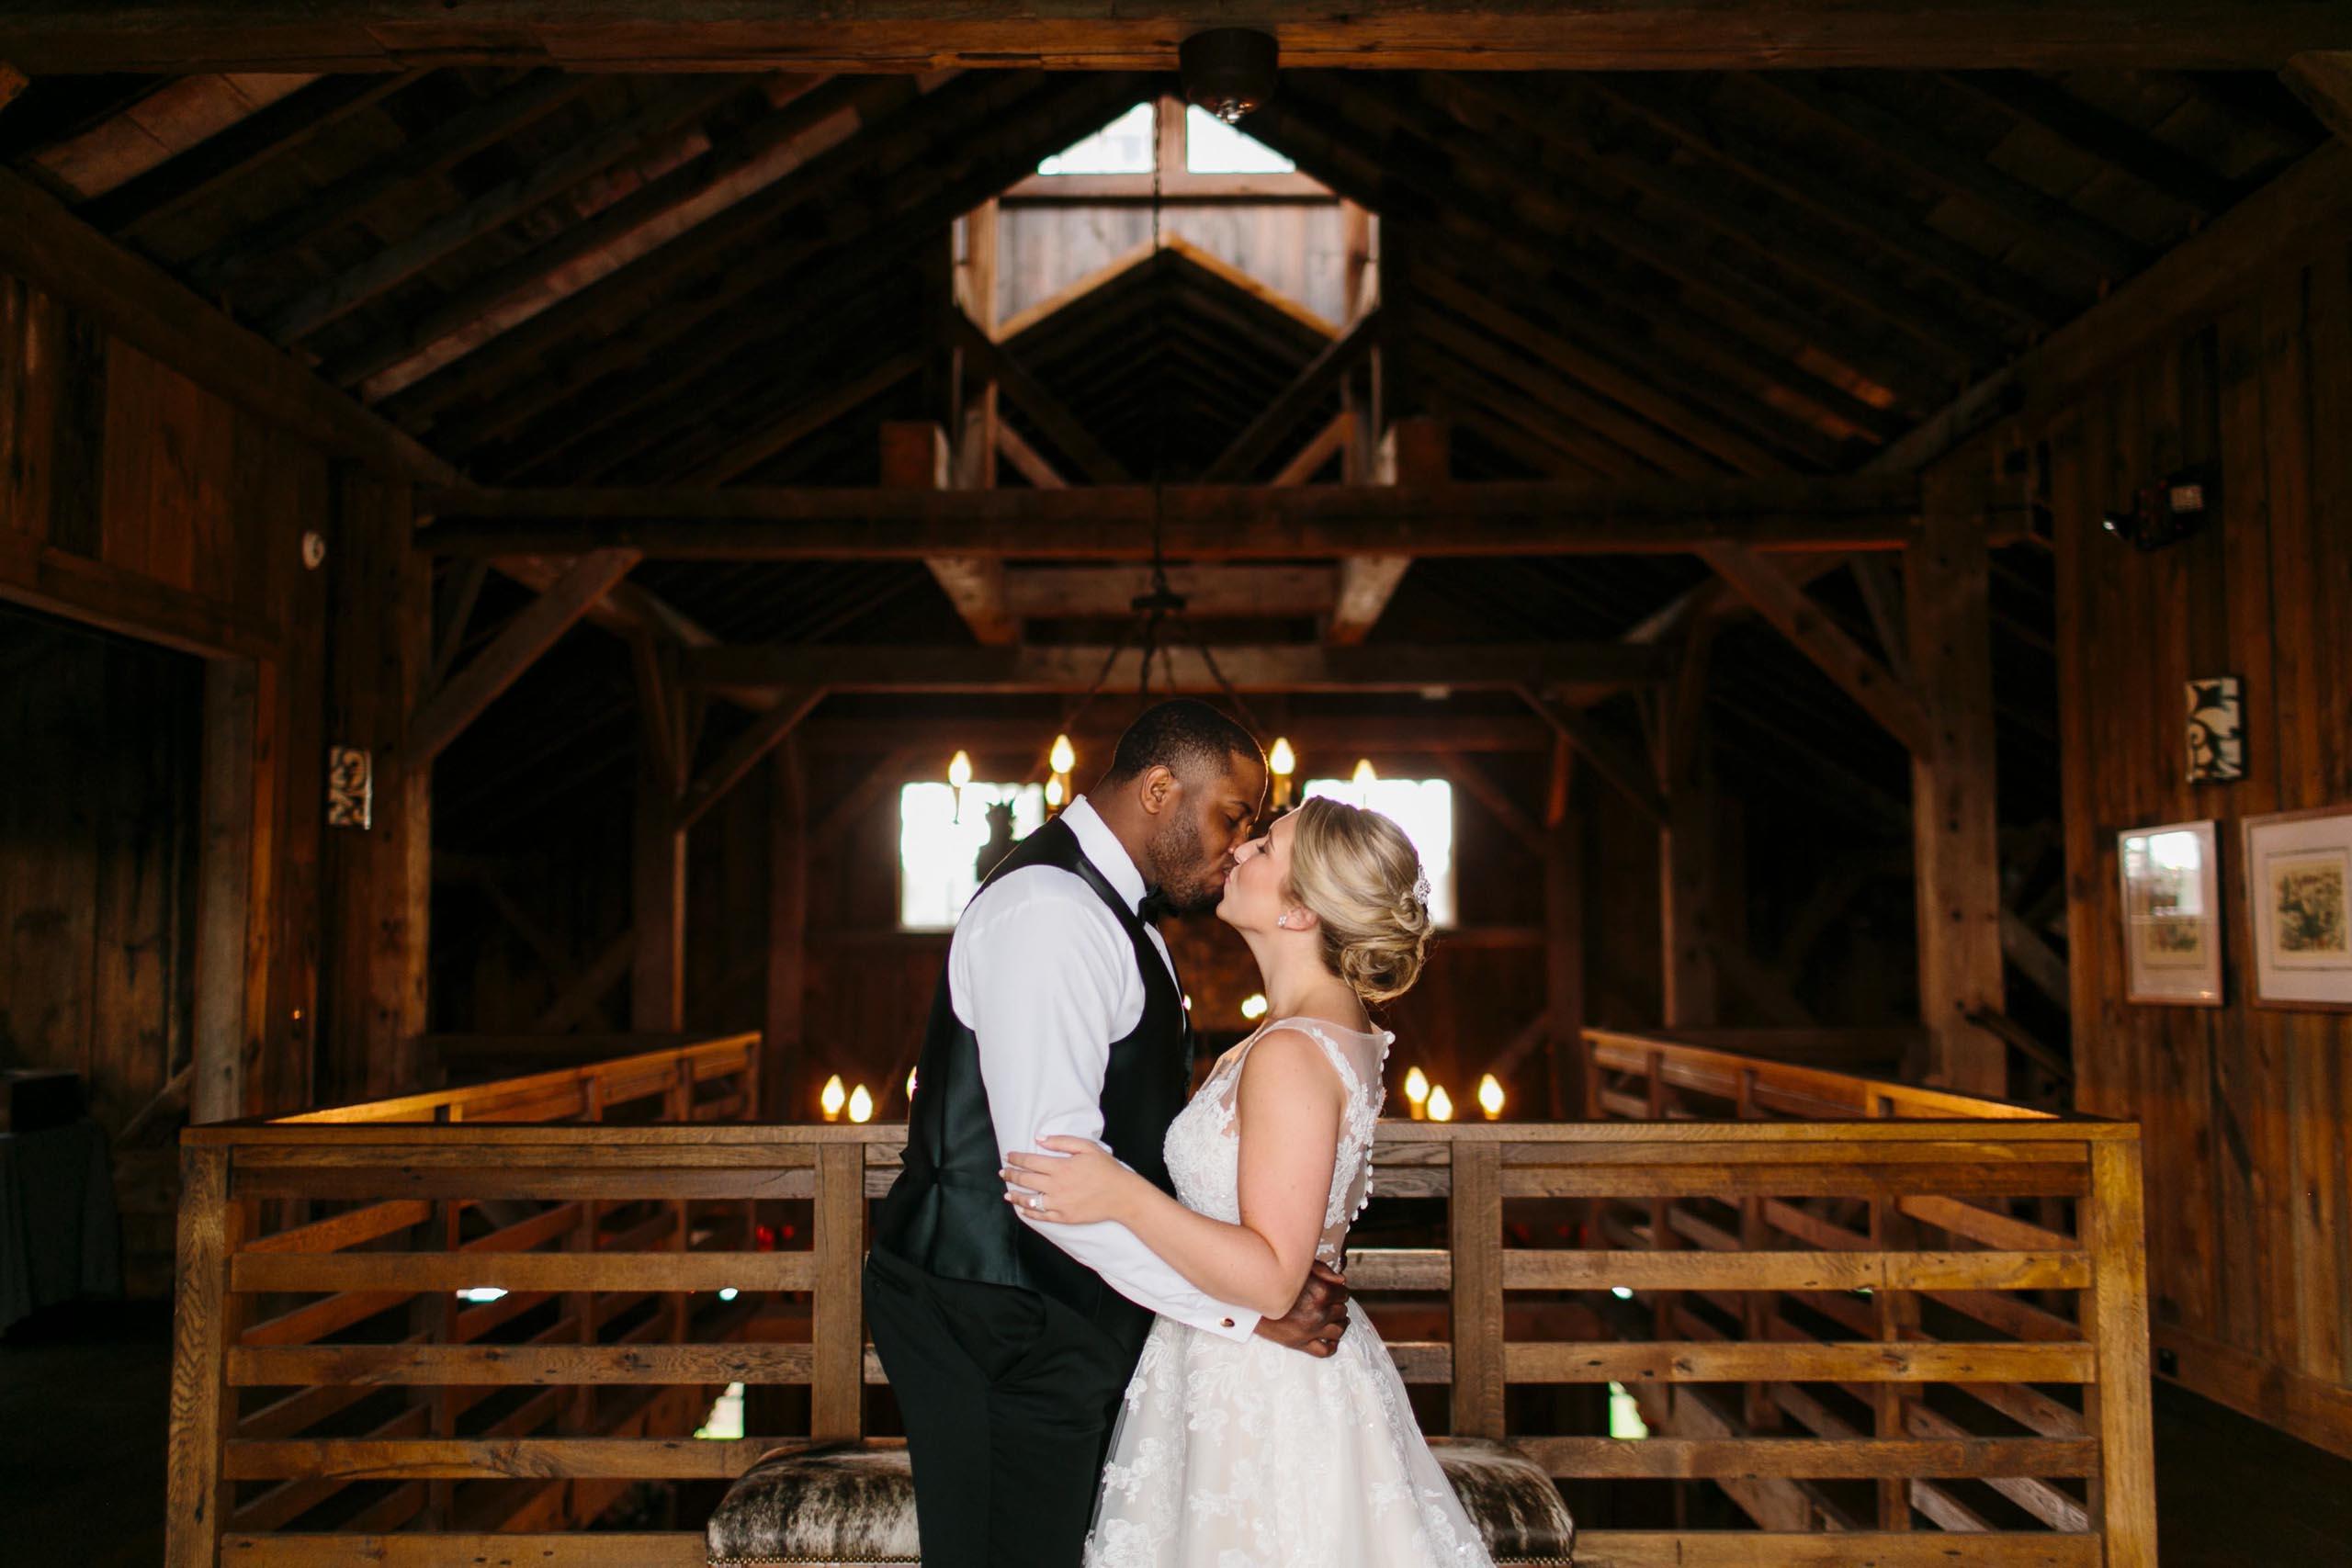 reynolds plantation wedding at sandy creek barn onenine imagesband \u2013 perfect 10 band